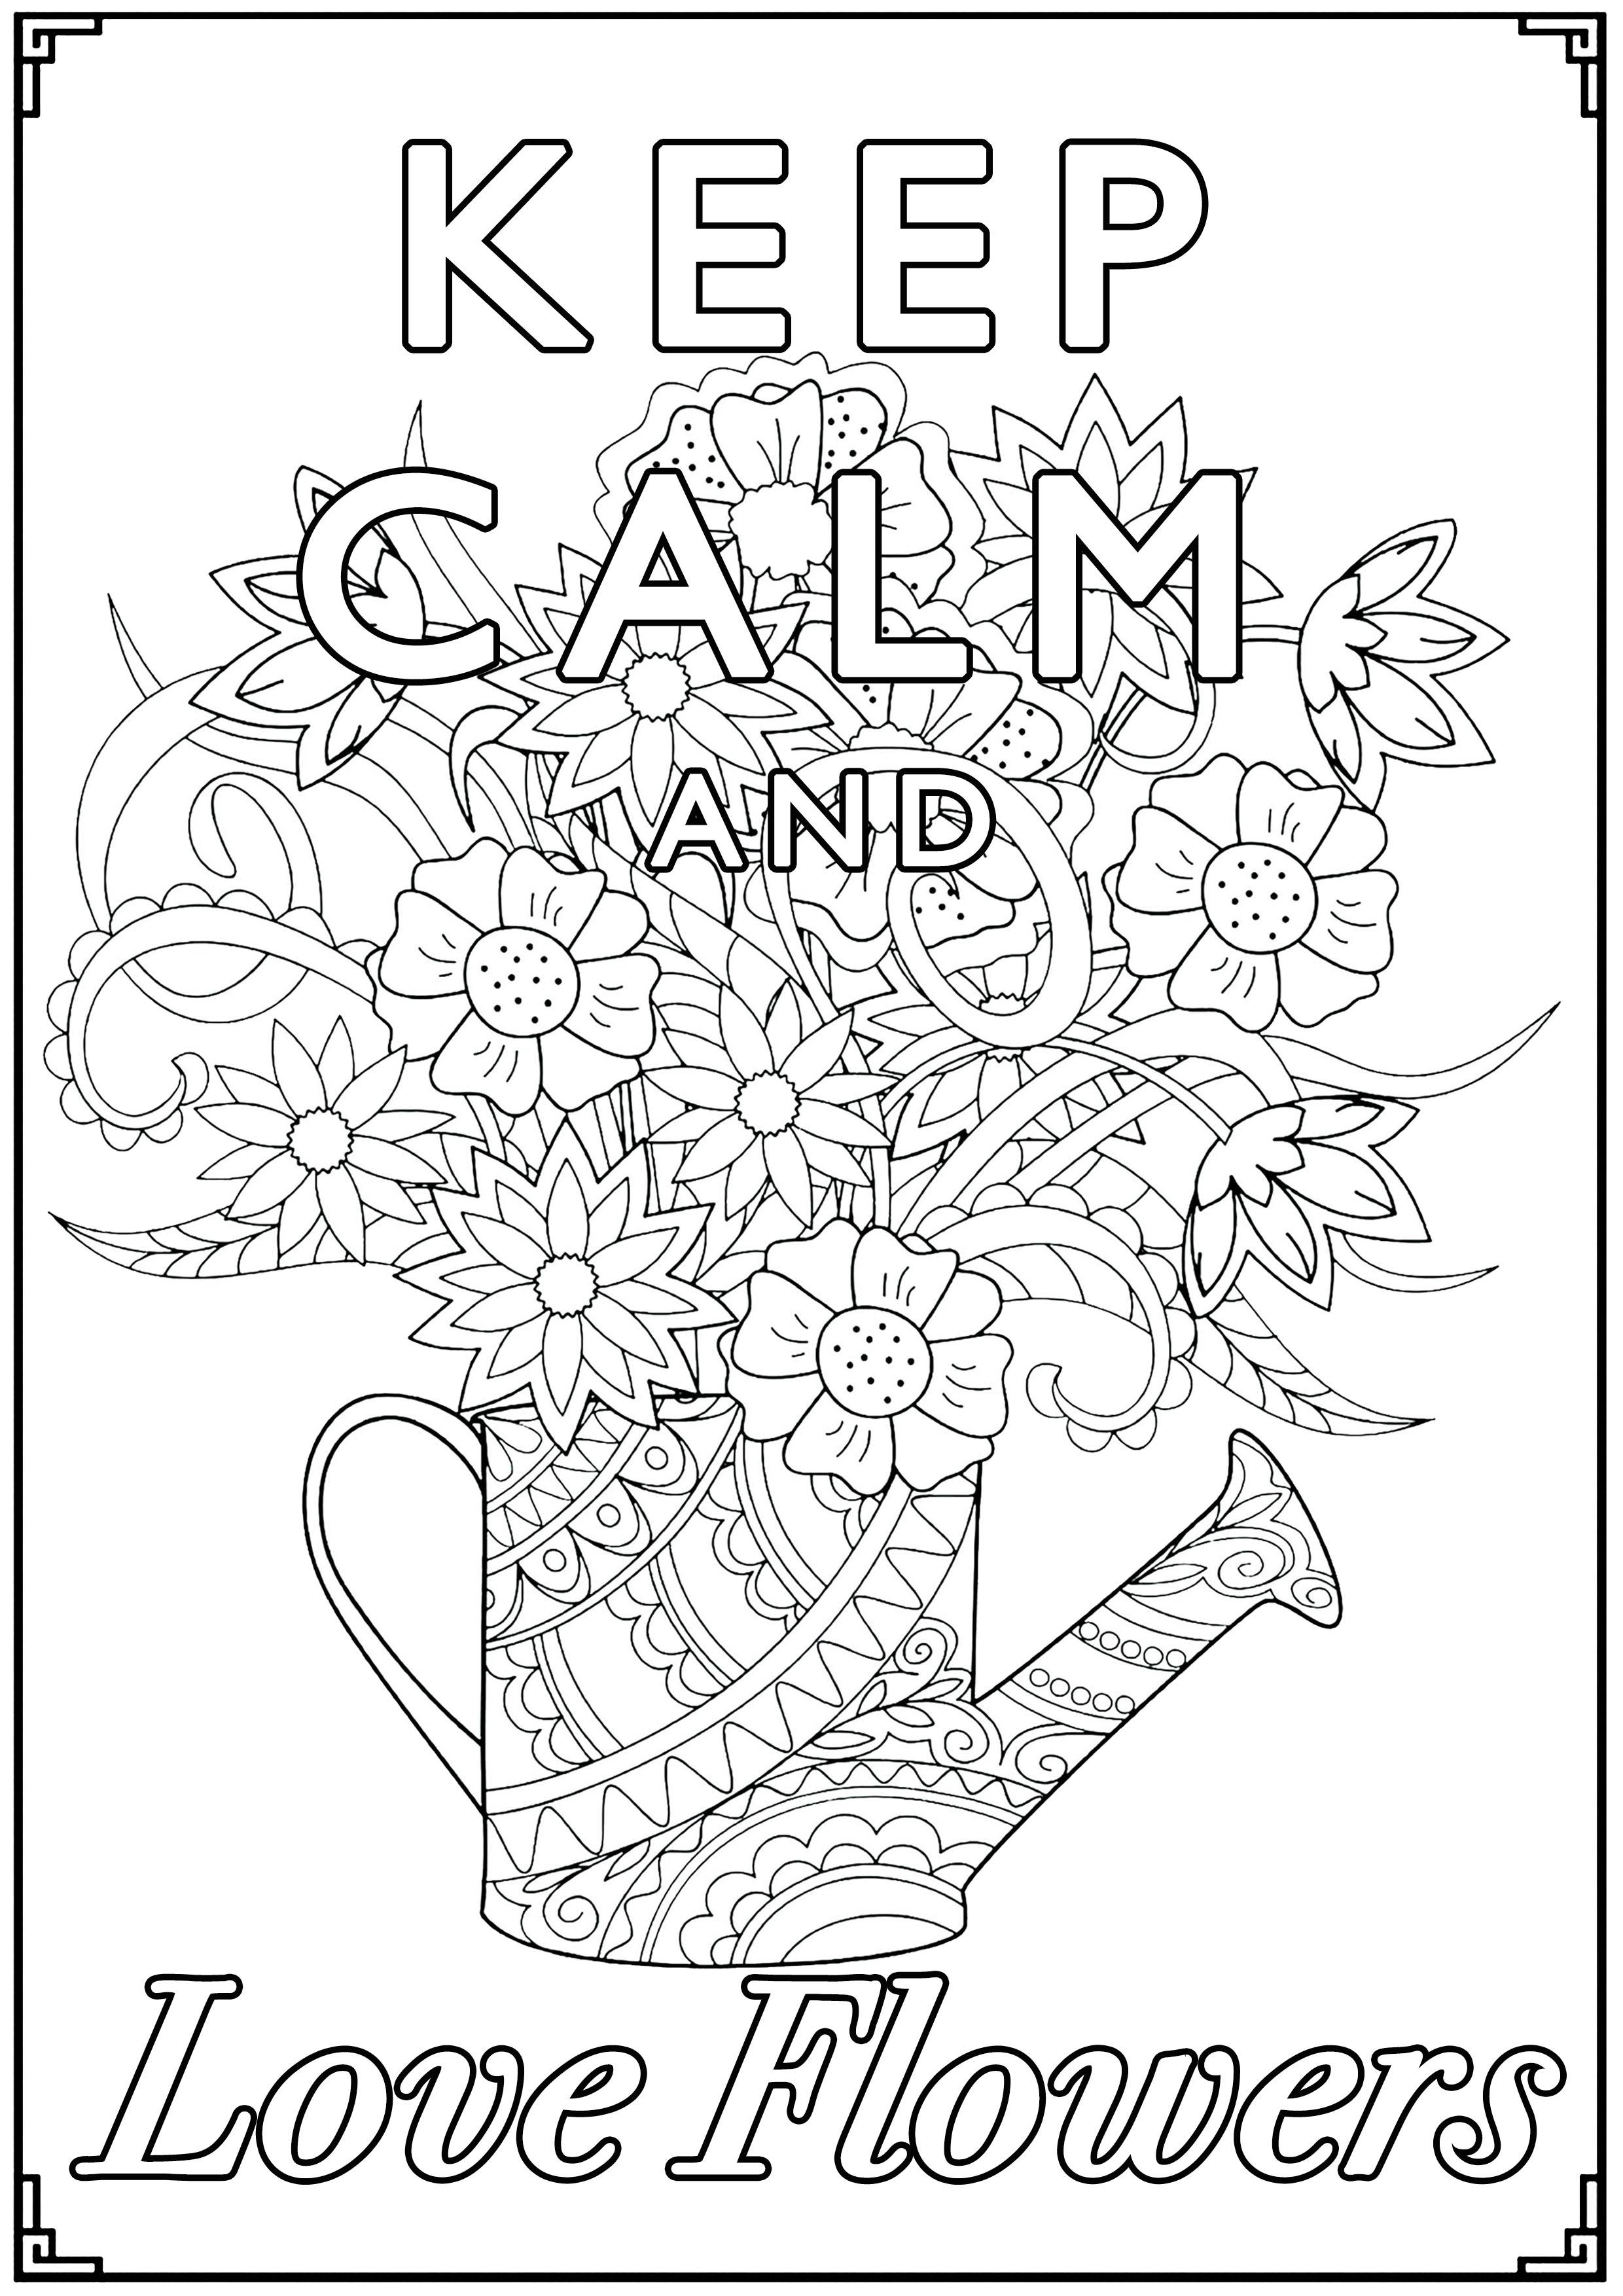 Disegni da Colorare per Adulti : Keep Calm - 2